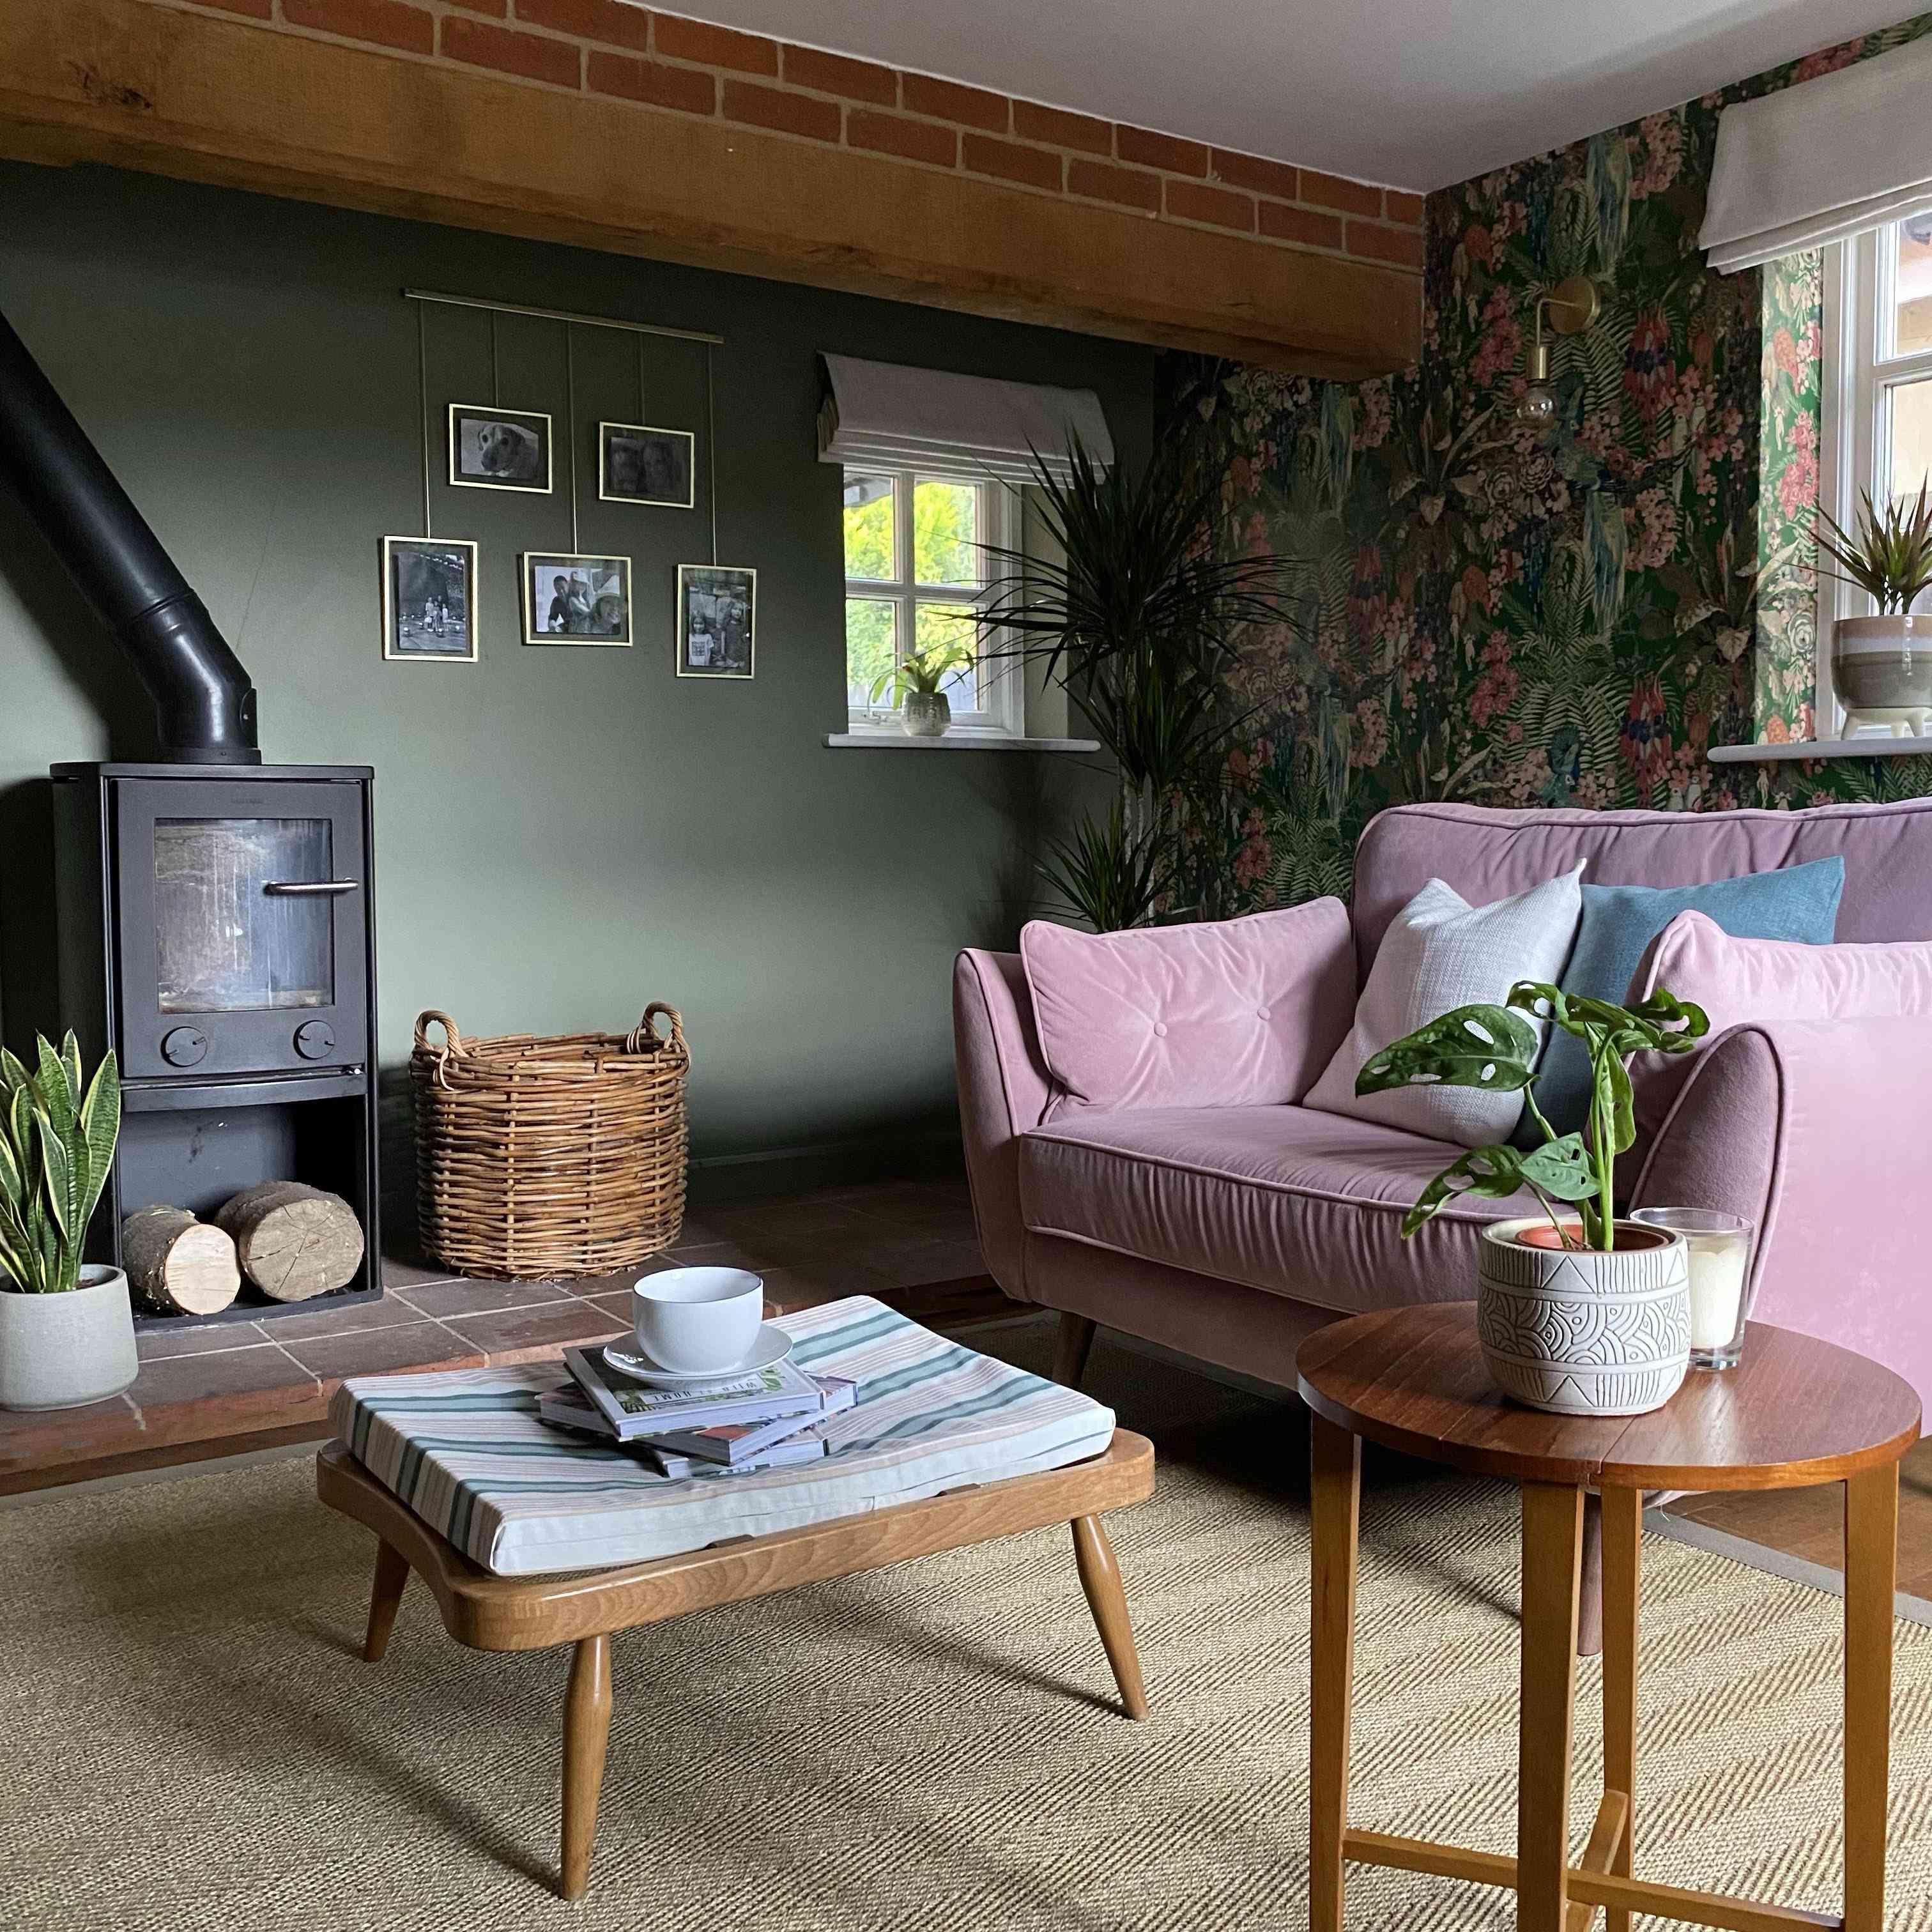 a living area features plenty of plants